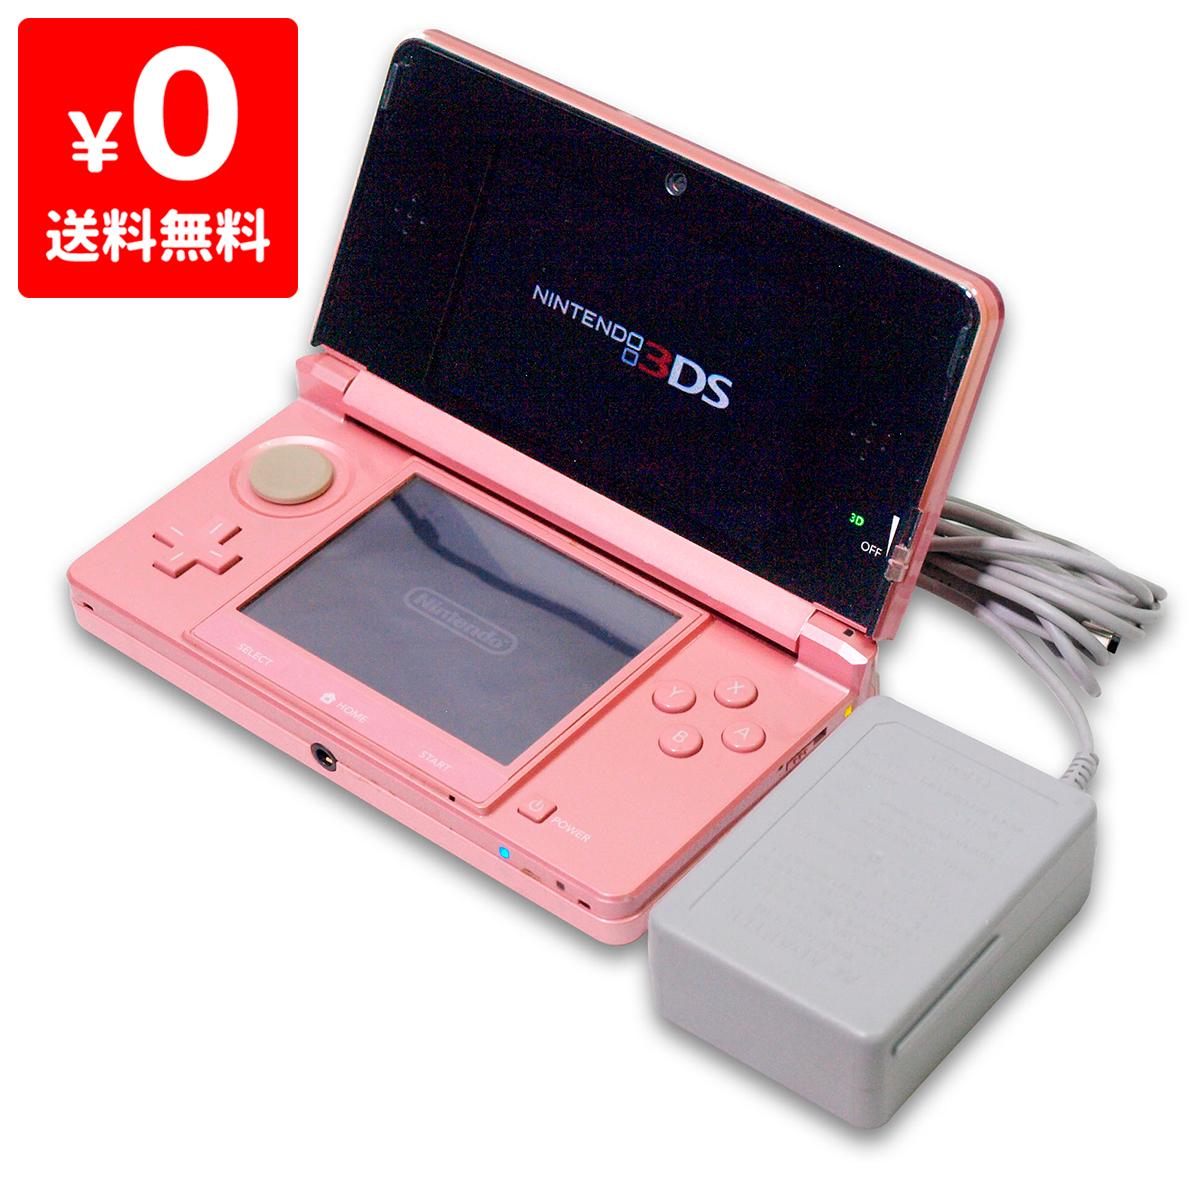 3DS 本体 ※アウトレット品 中古 すぐ遊べるセット 任天堂 ニンテンドー 4902370519129 ミスティピンクCTR-S-PAAA 出荷 ニンテンドー3DS Nintendo